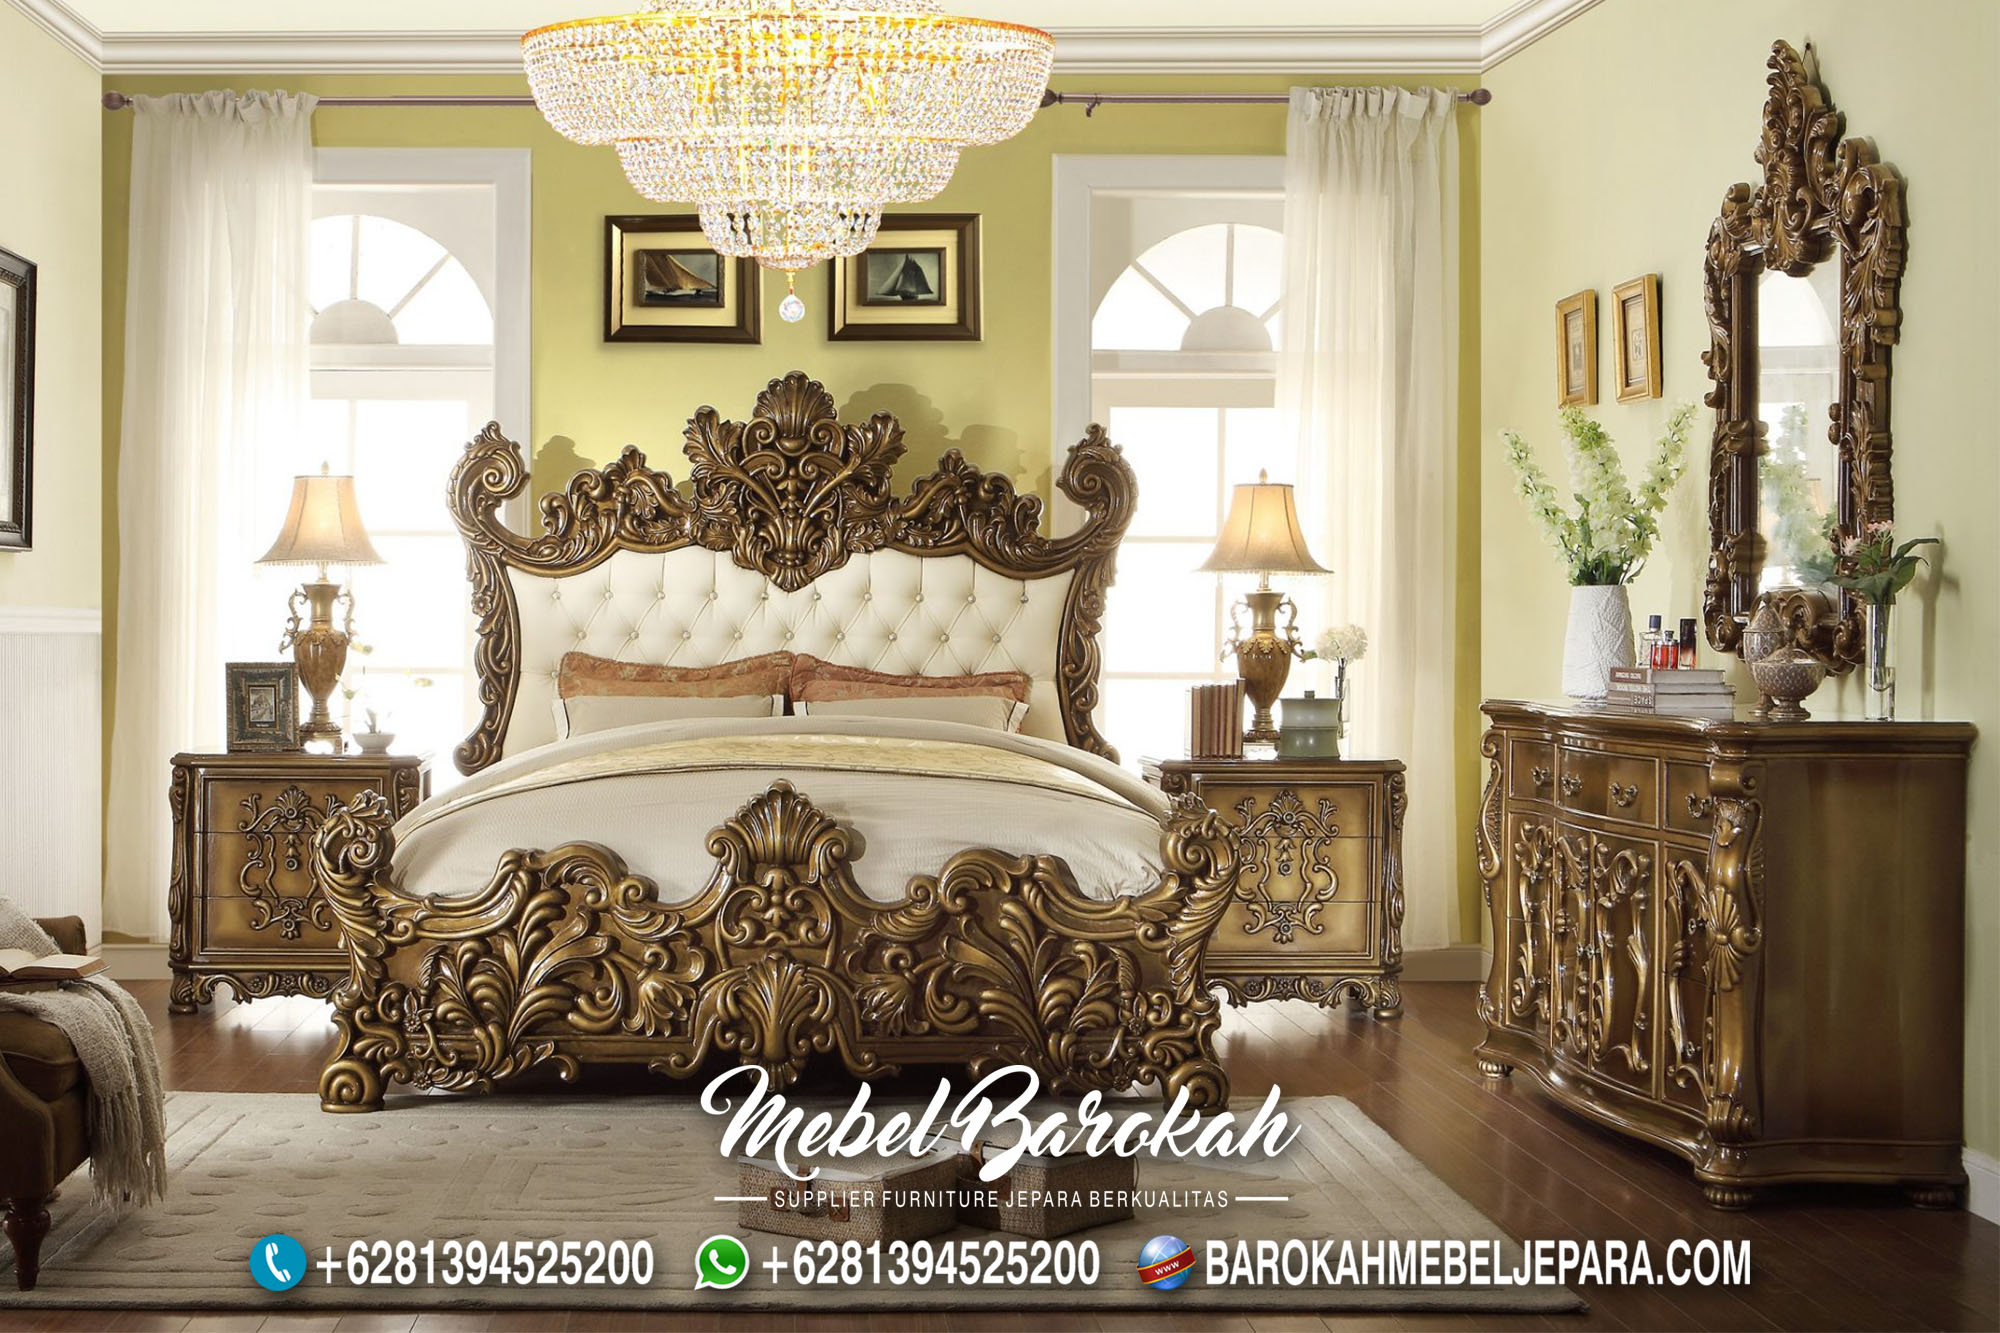 Bedroom Italian Luxury Casual Ukir MB-694